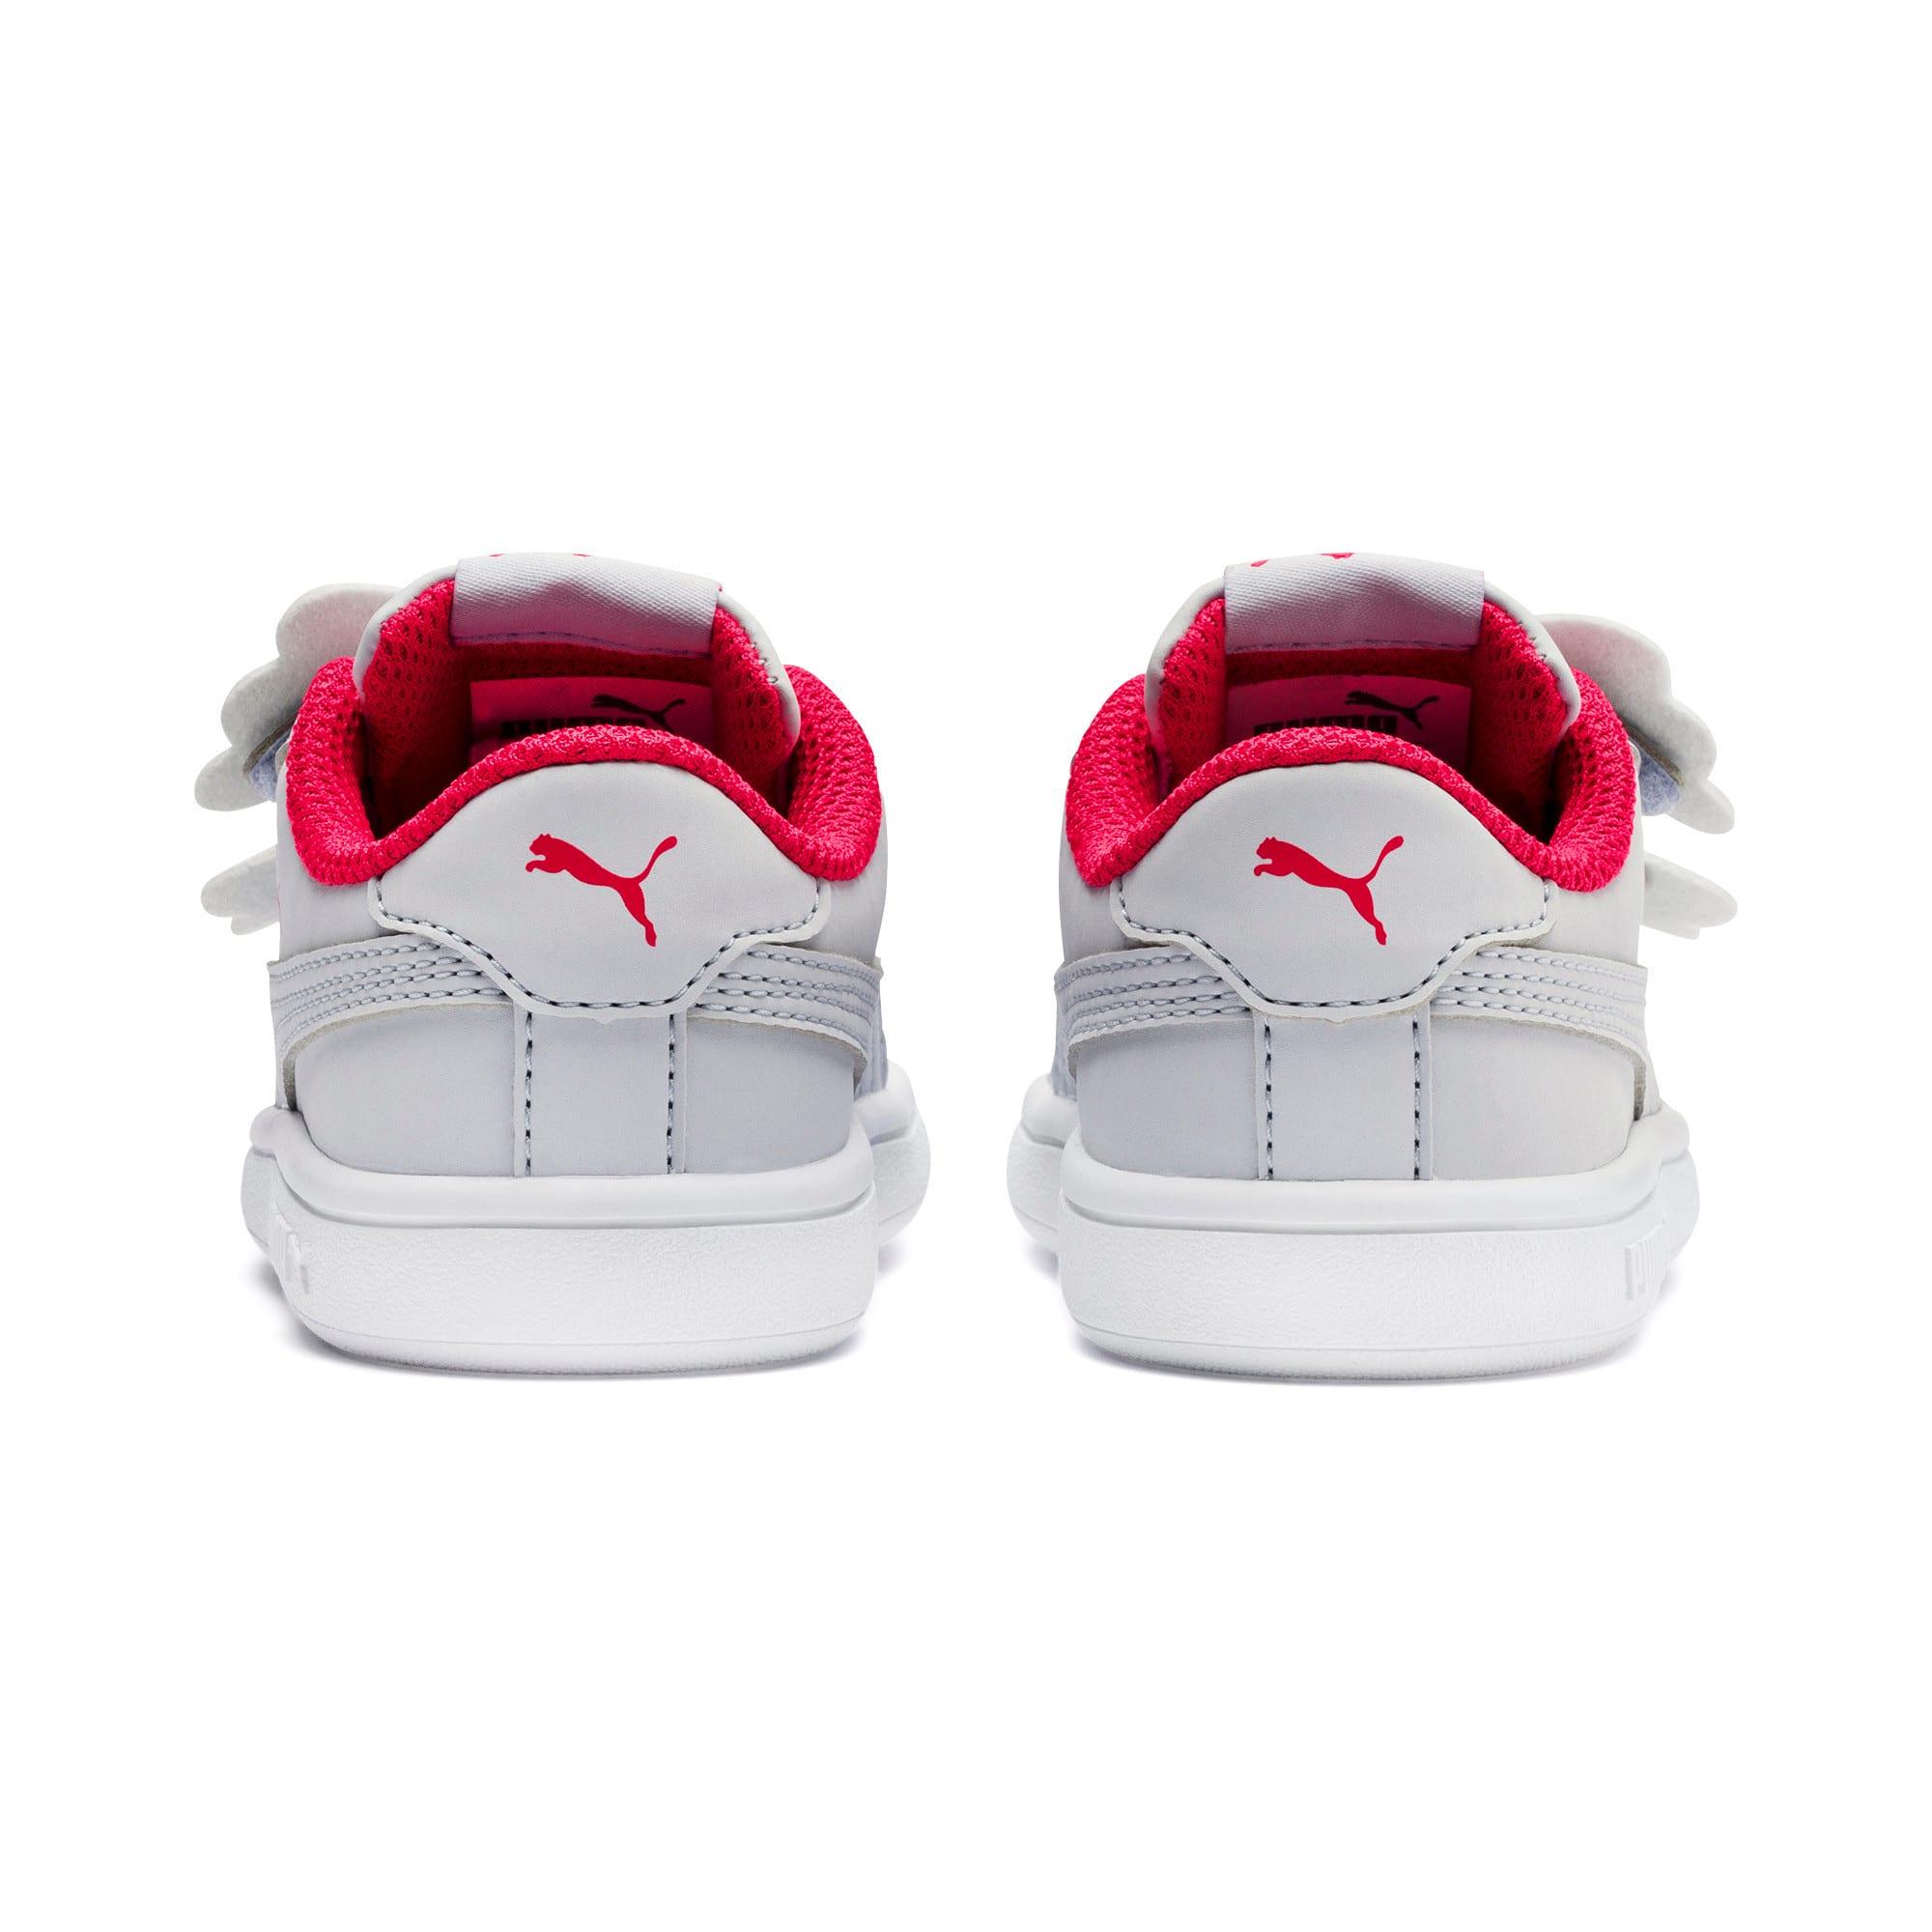 Thumbnail 3 of PUMA Smash v2 Butterfly AC Toddler Shoes, Heather-Nrgy Rose-Puma White, medium